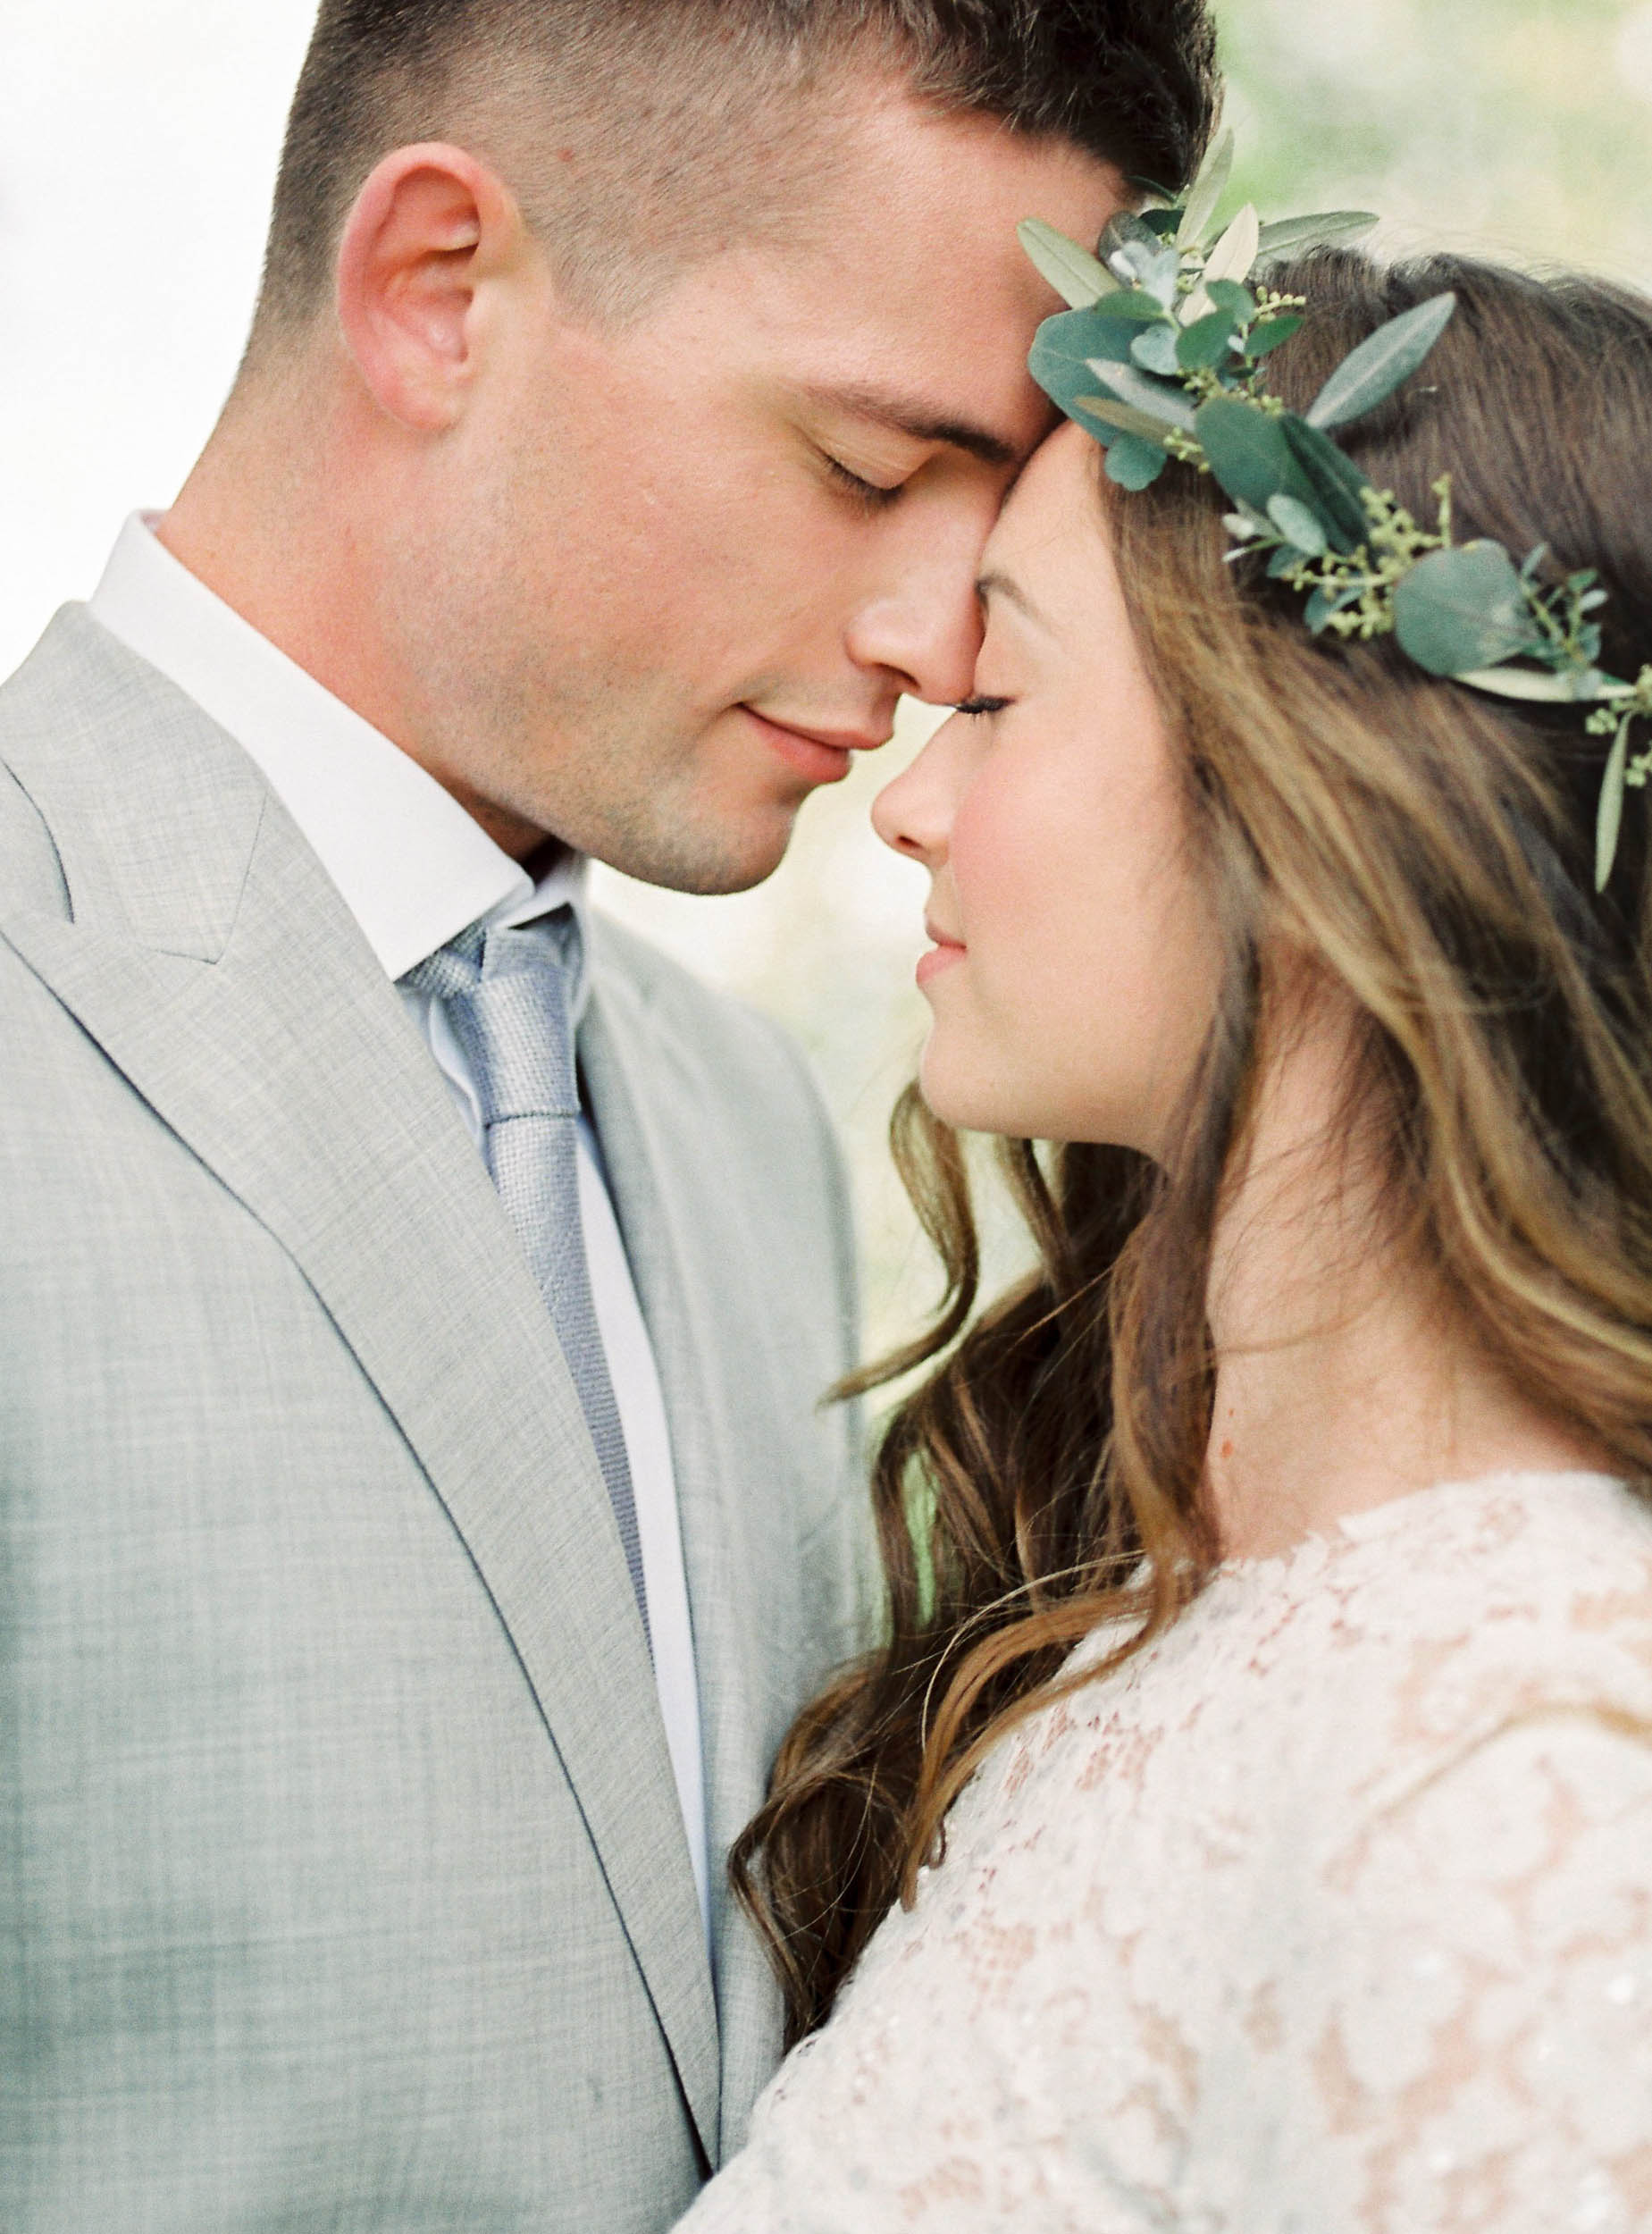 Amy O'Boyle Photography- Destination & UK Fine Art Film Wedding Photographer- Stubton Hall Wedding Shoot-11.jpg